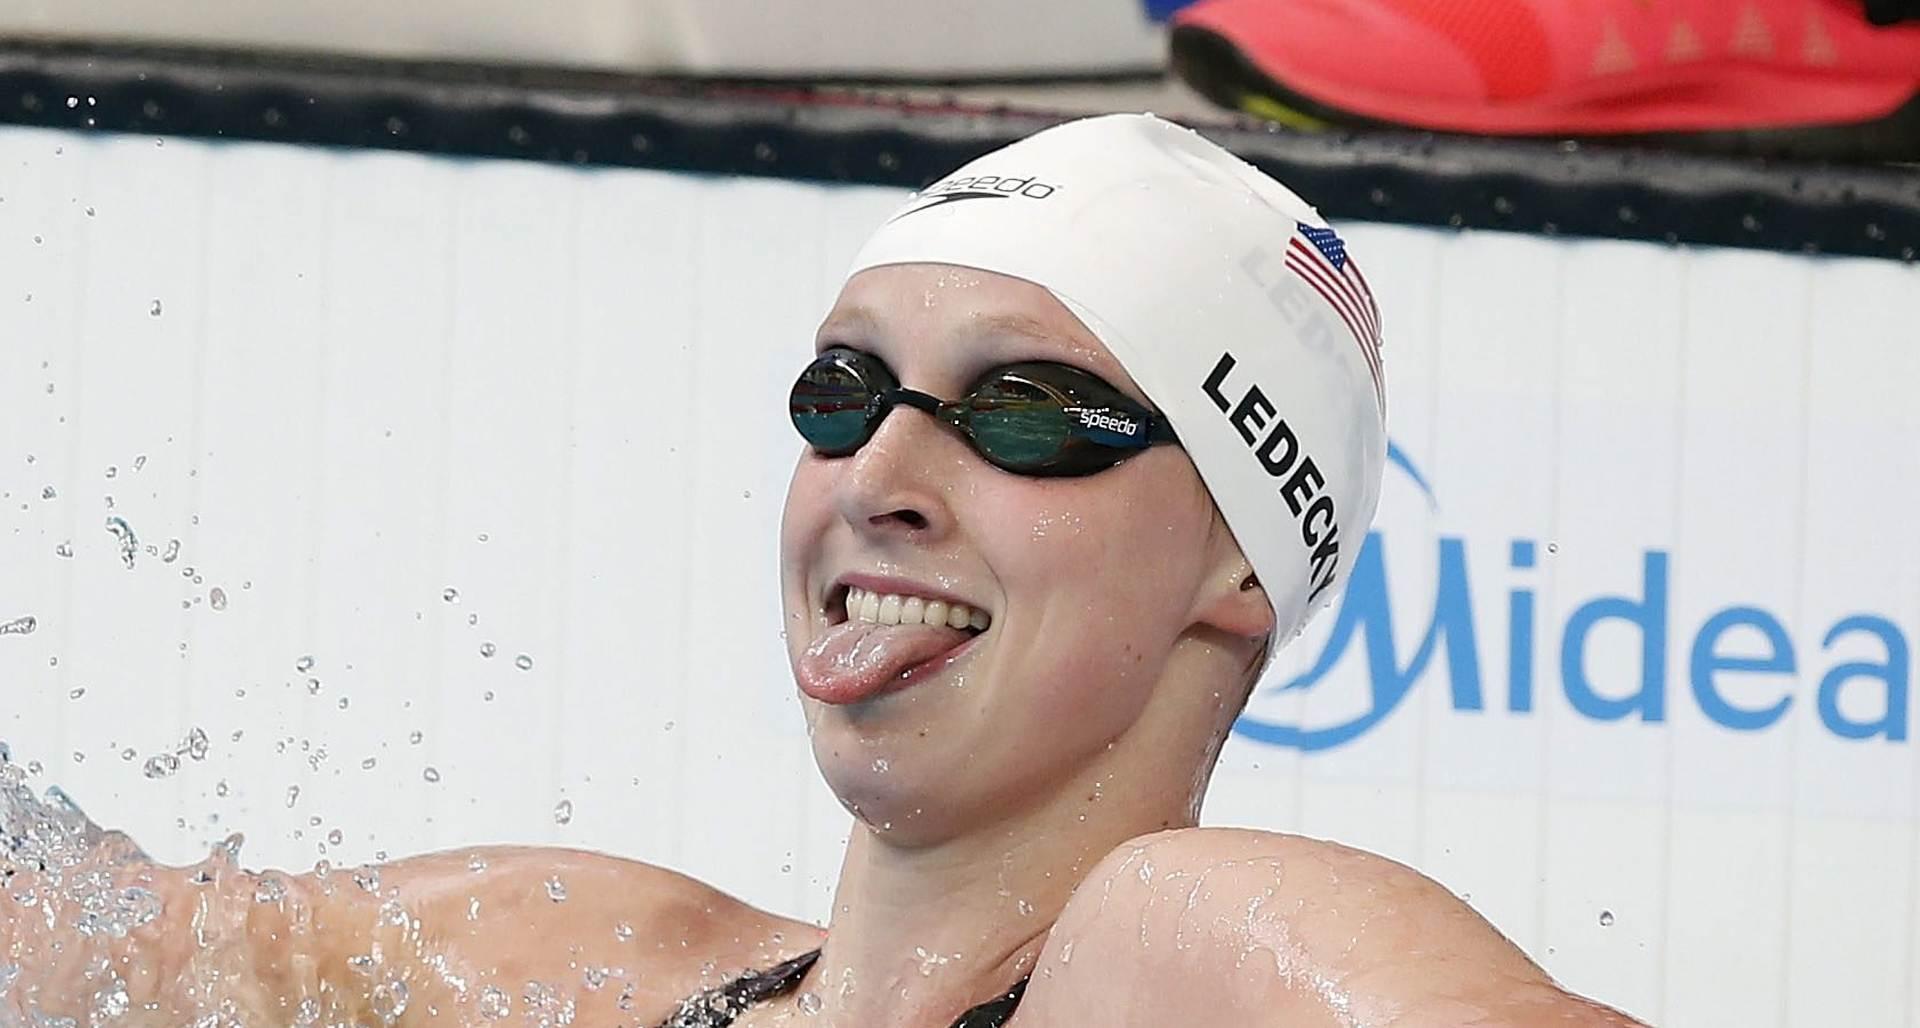 SP plivanje: Svjetski rekord Ledecky na 1500m